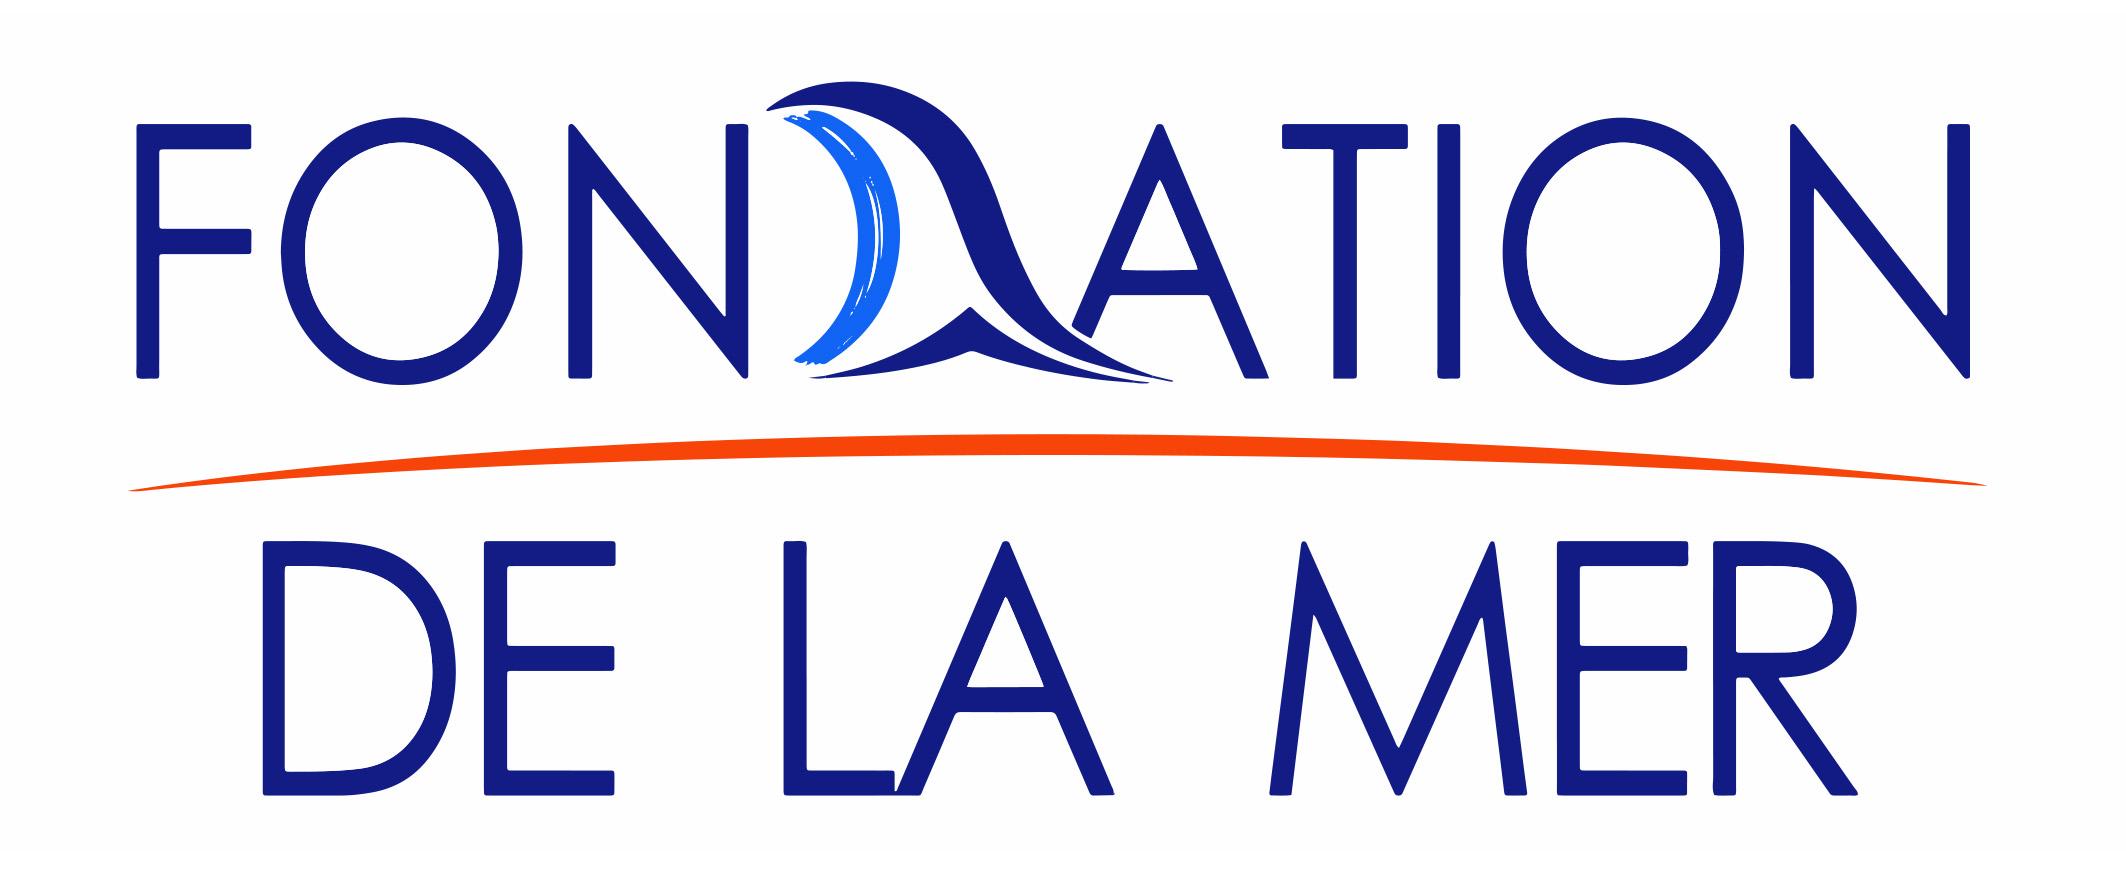 organization_logo_1574780889_fondation-de-la-mer